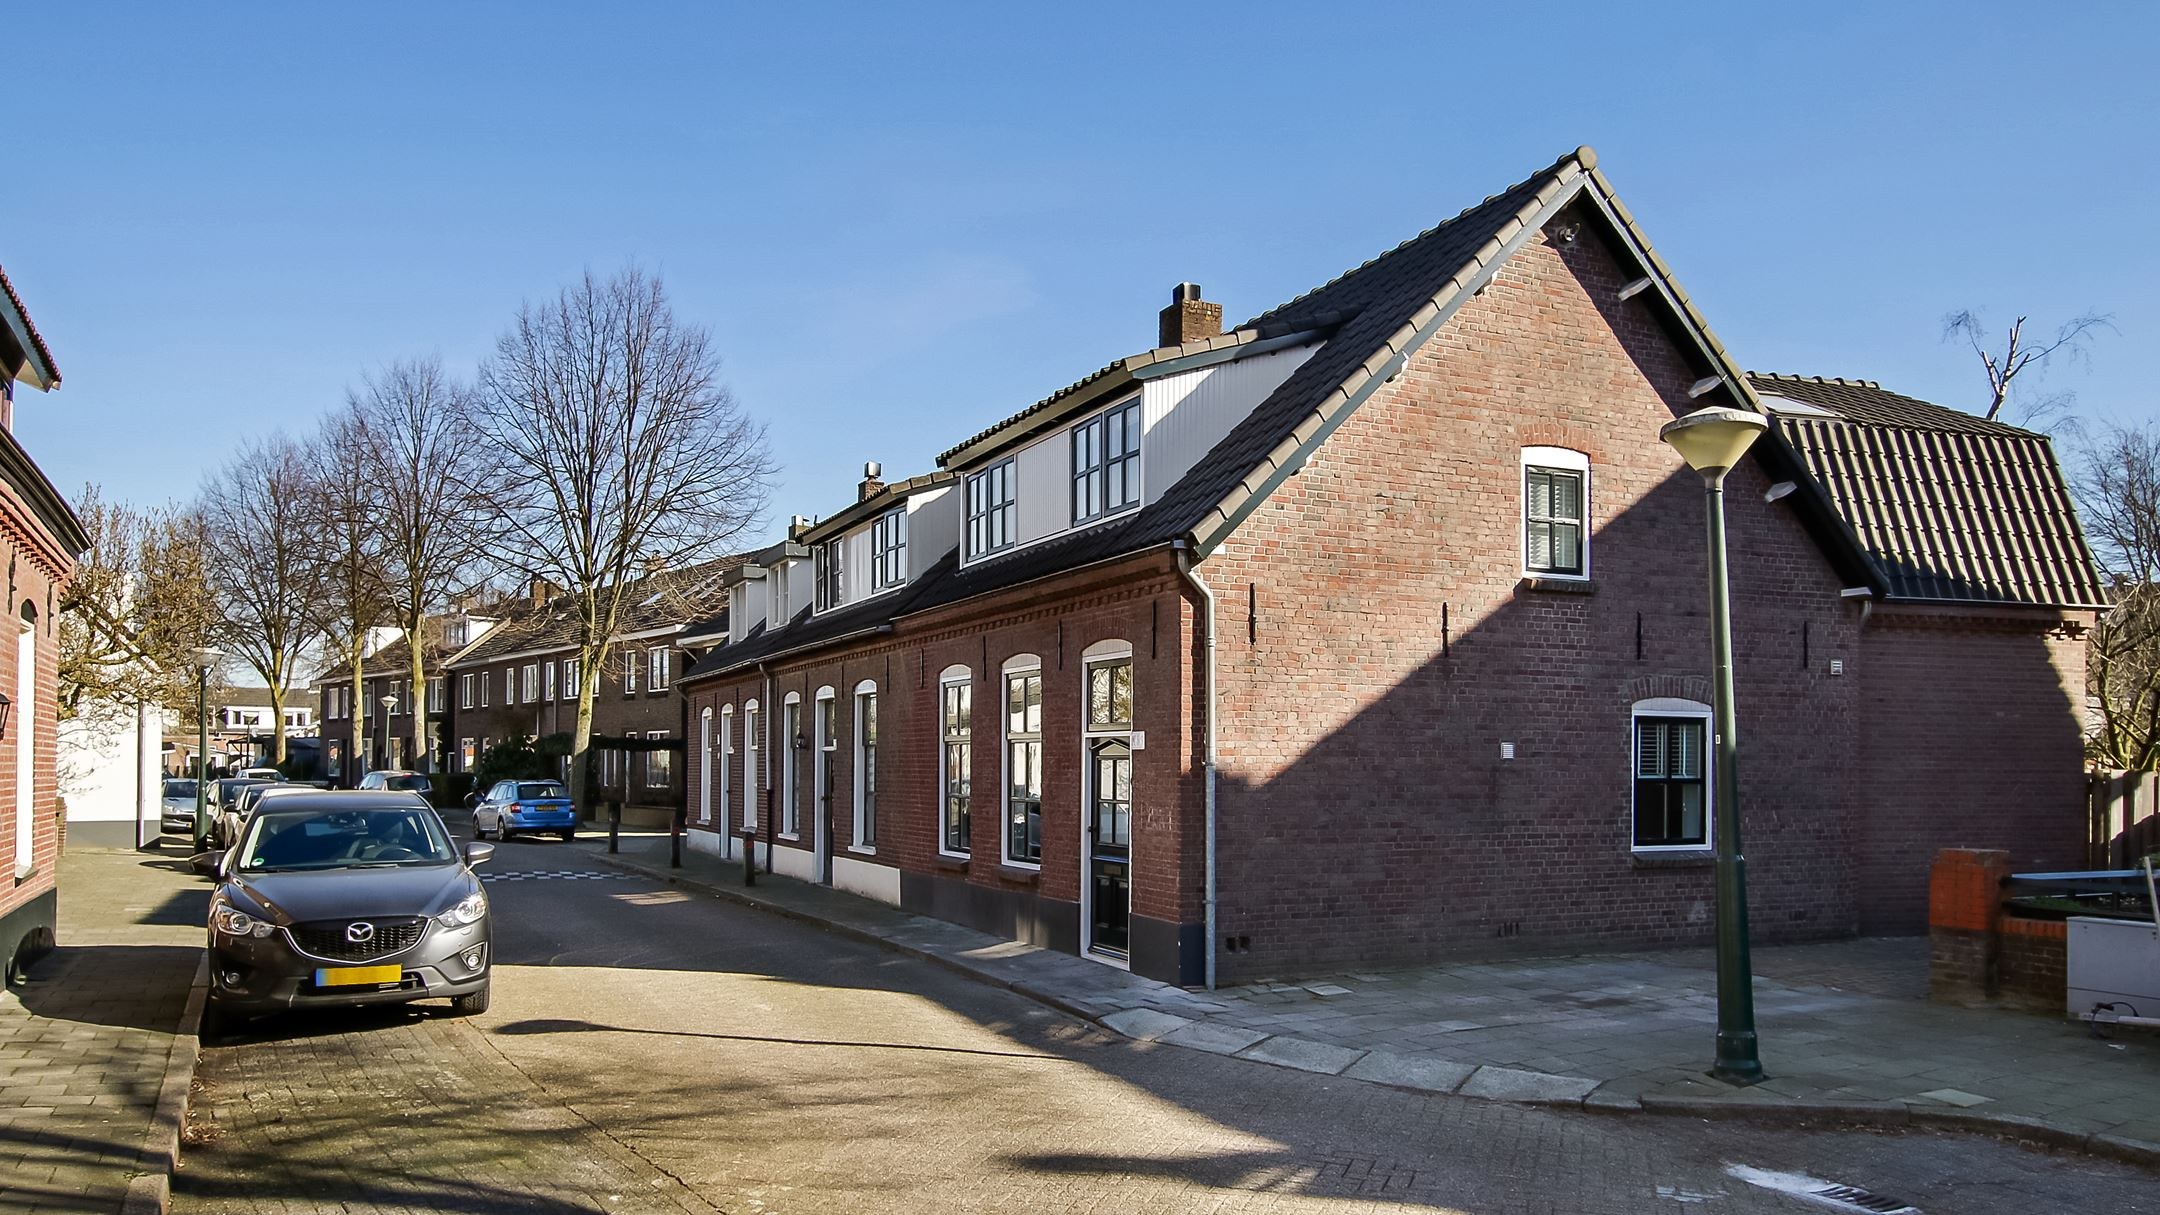 Melkweg Garderobe Prijs.Verkocht Melkweg 59 5642 Cr Eindhoven Funda